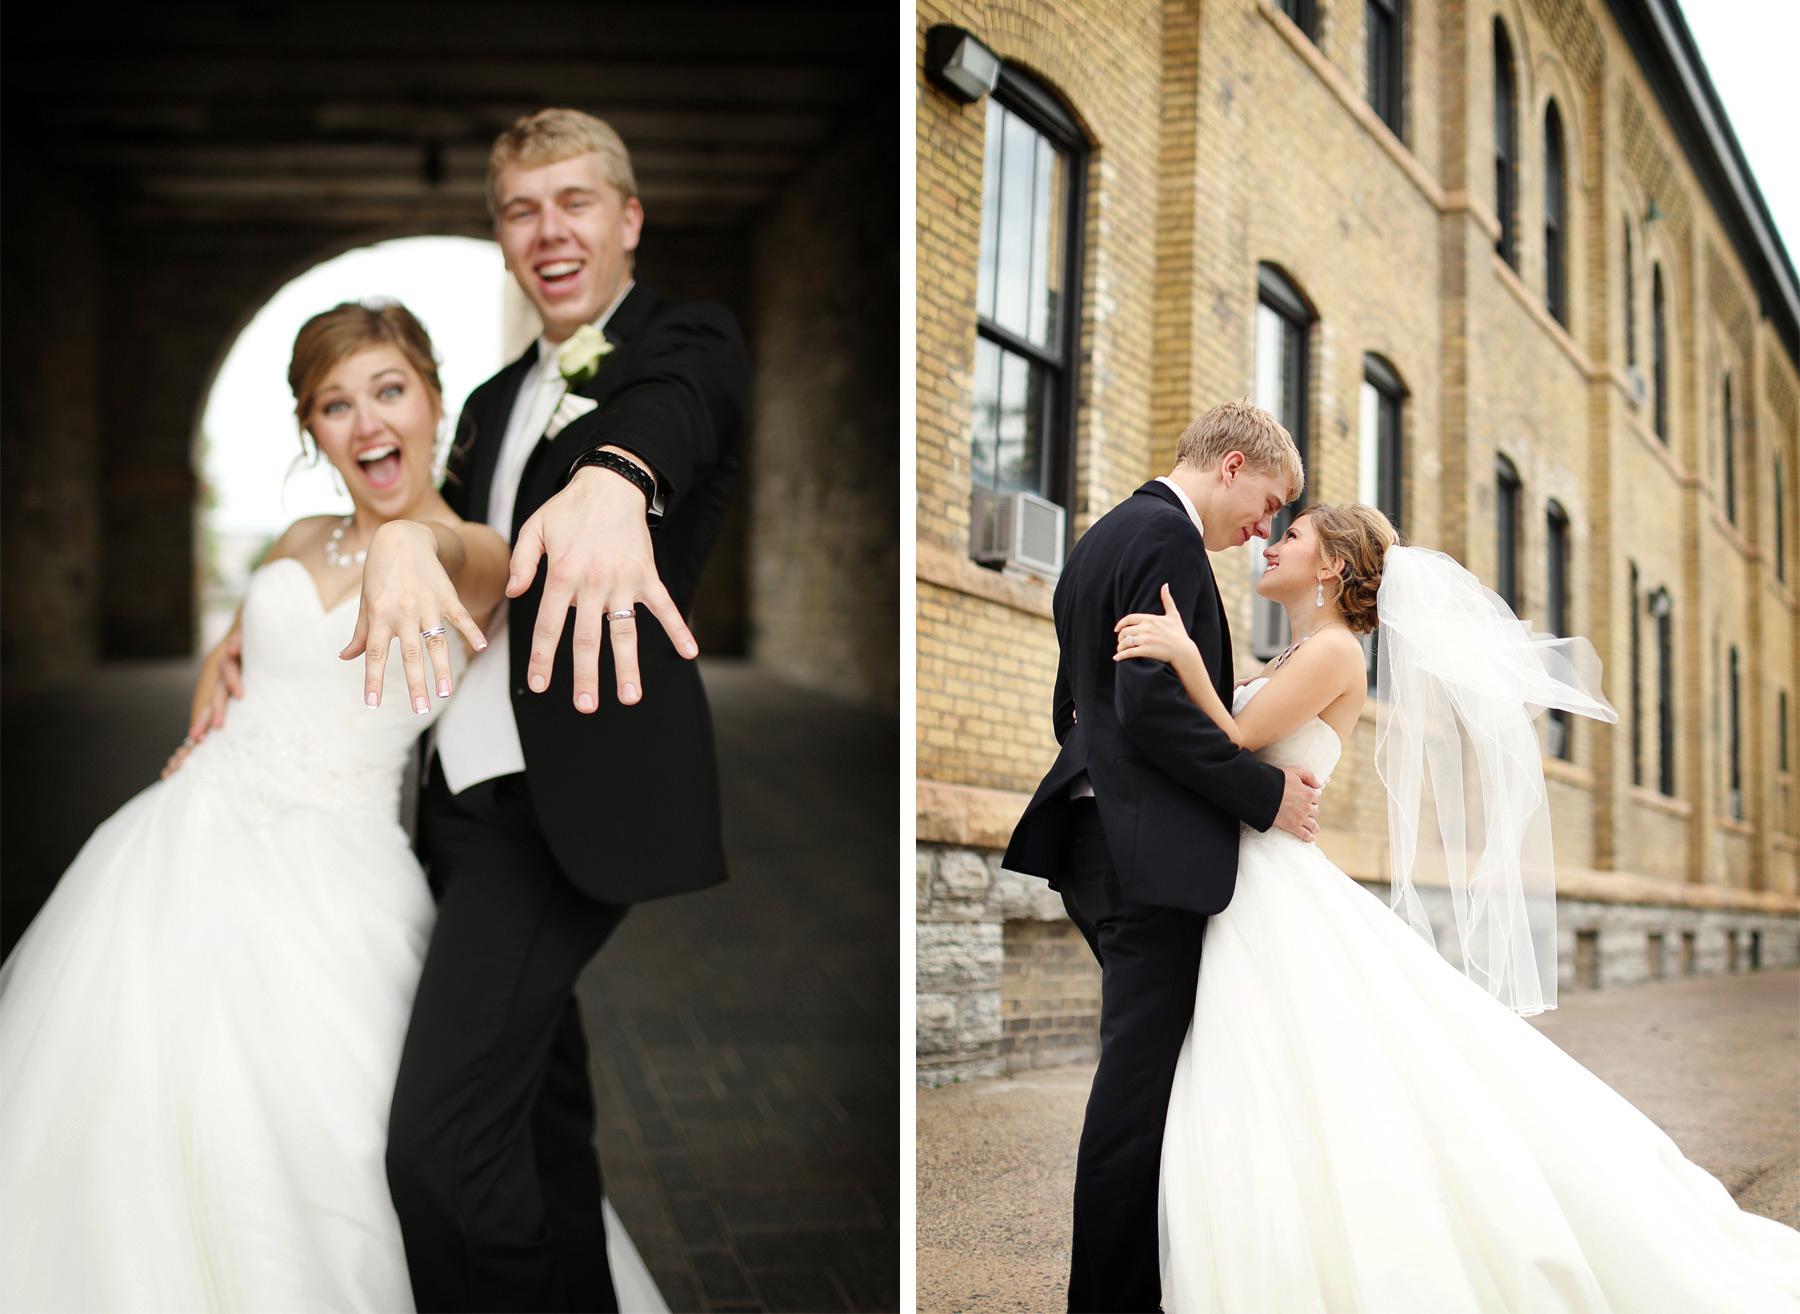 08-Minneapolis-Minnesota-Wedding-Photography-by-Vick-Photography-Courtney-&-John.jpg